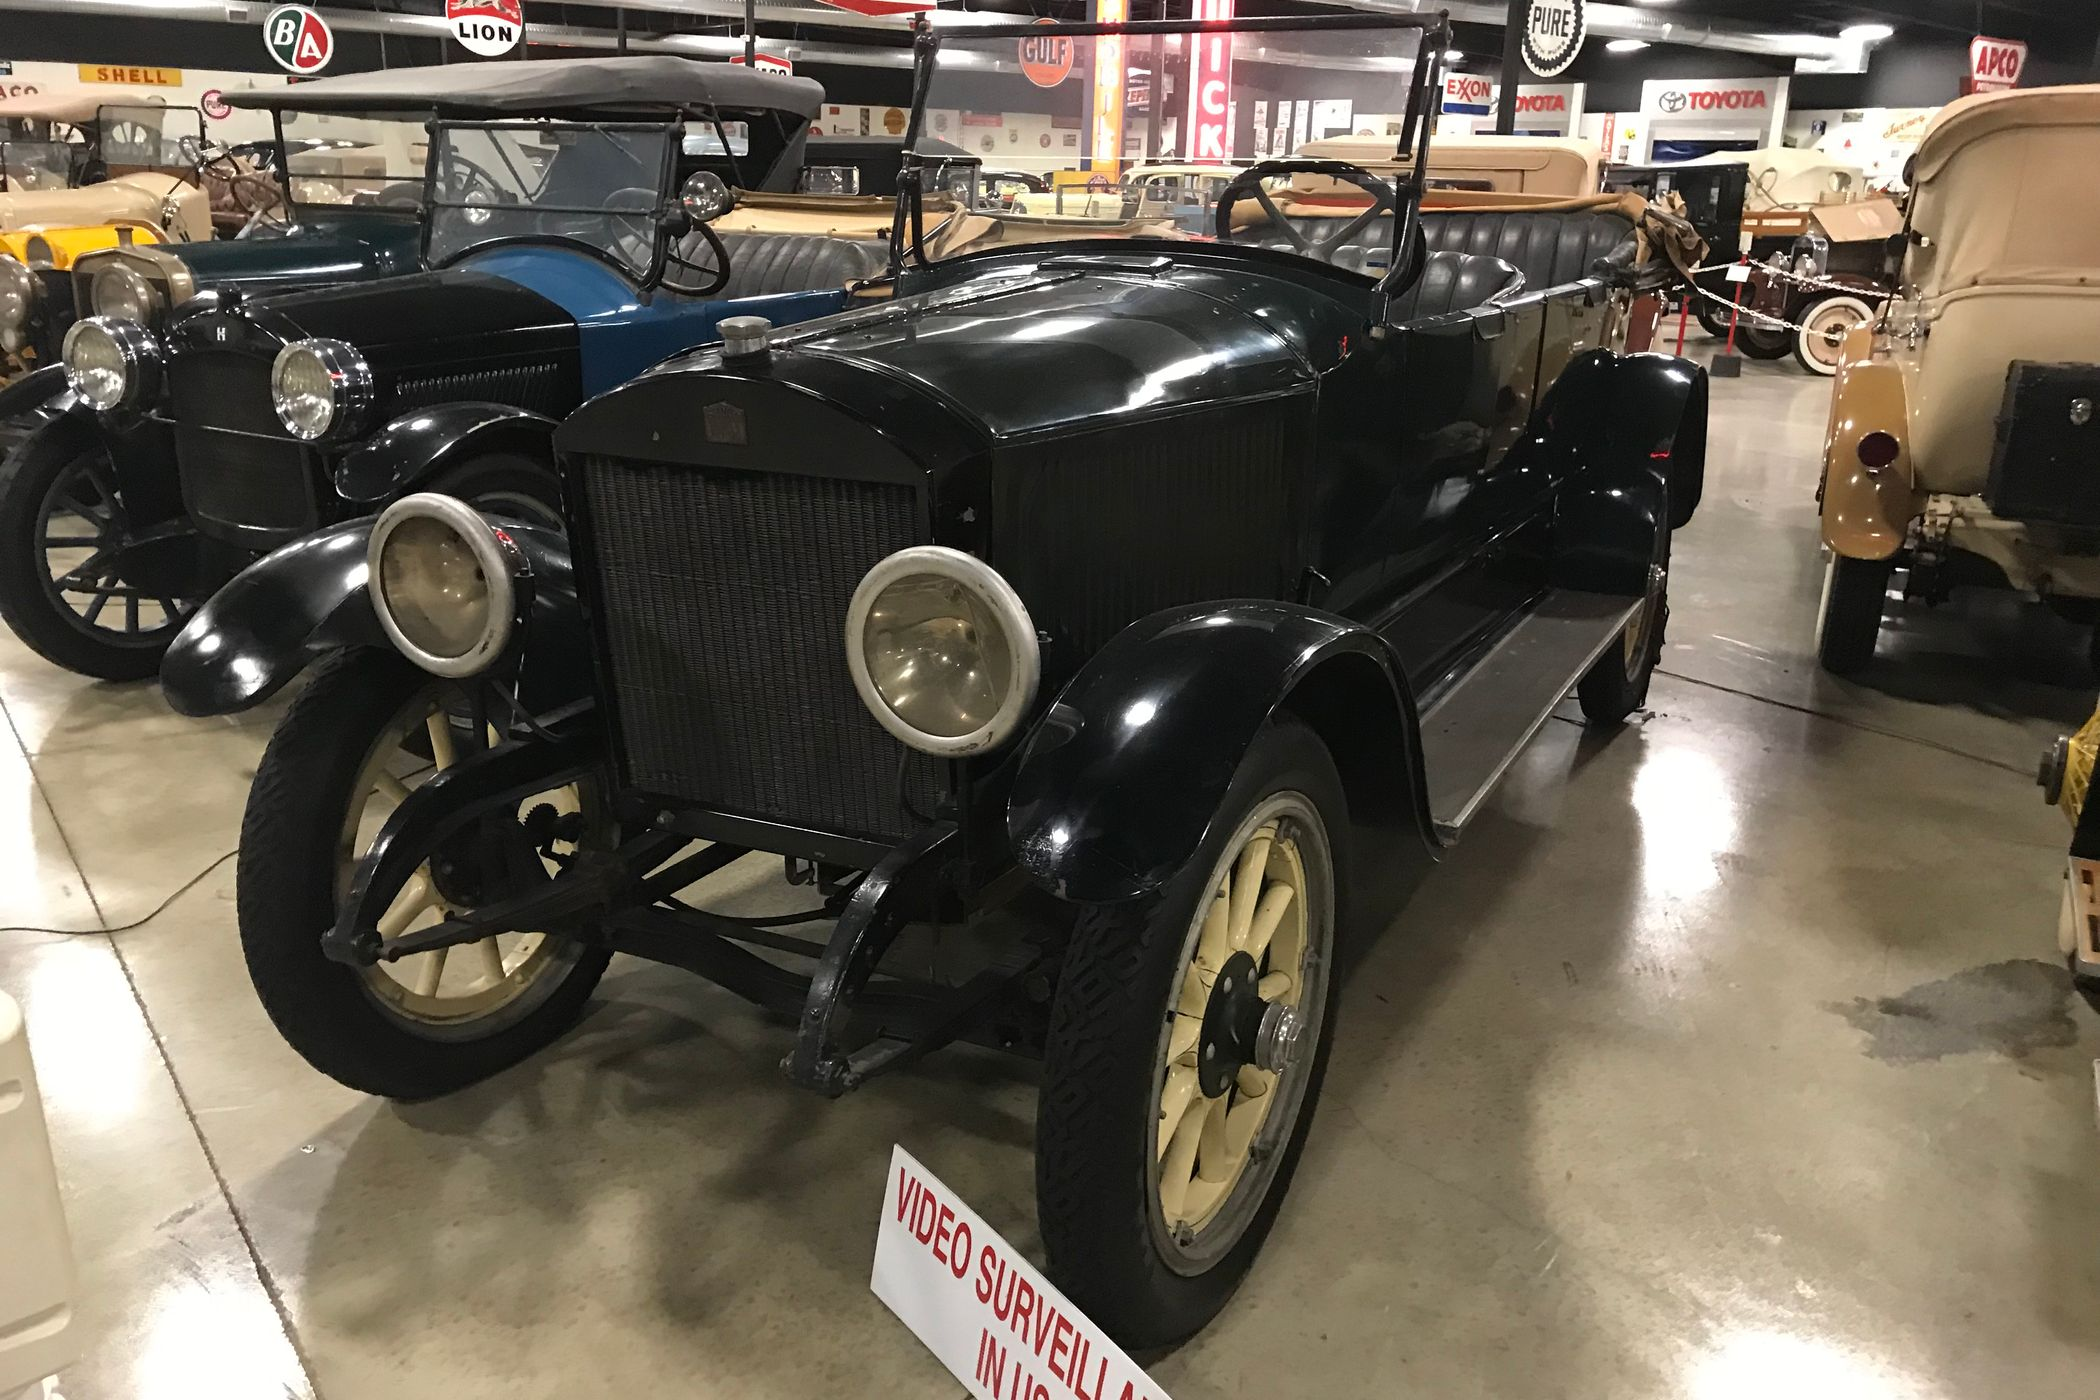 A Little Gem In Tupelo Mississippi HistoricRacingNewscom - Tupelo car show